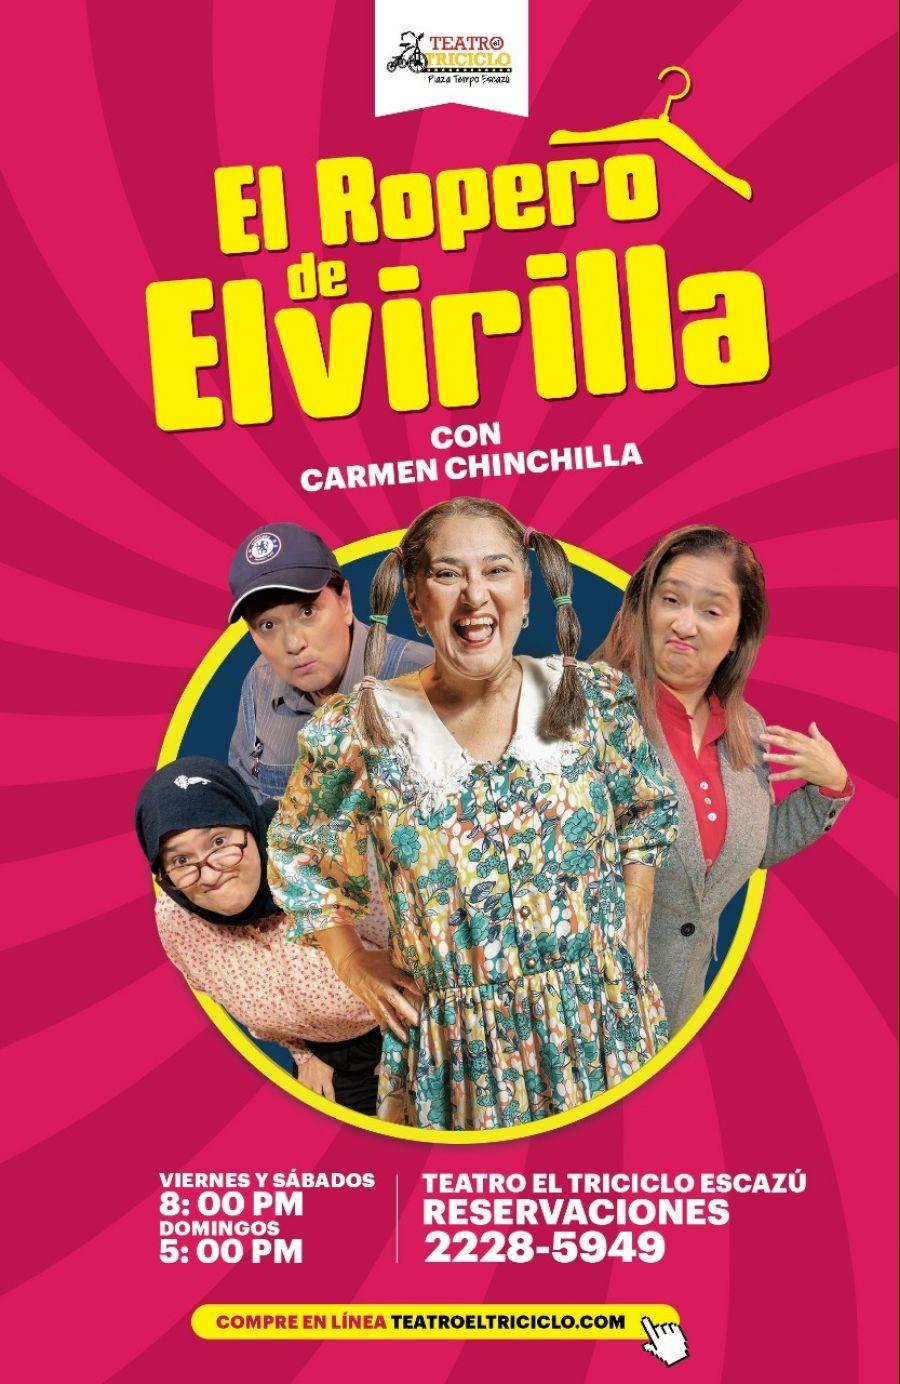 El ropero de Elvirilla. Carmen Chinchilla & Randall Robles. Comedia